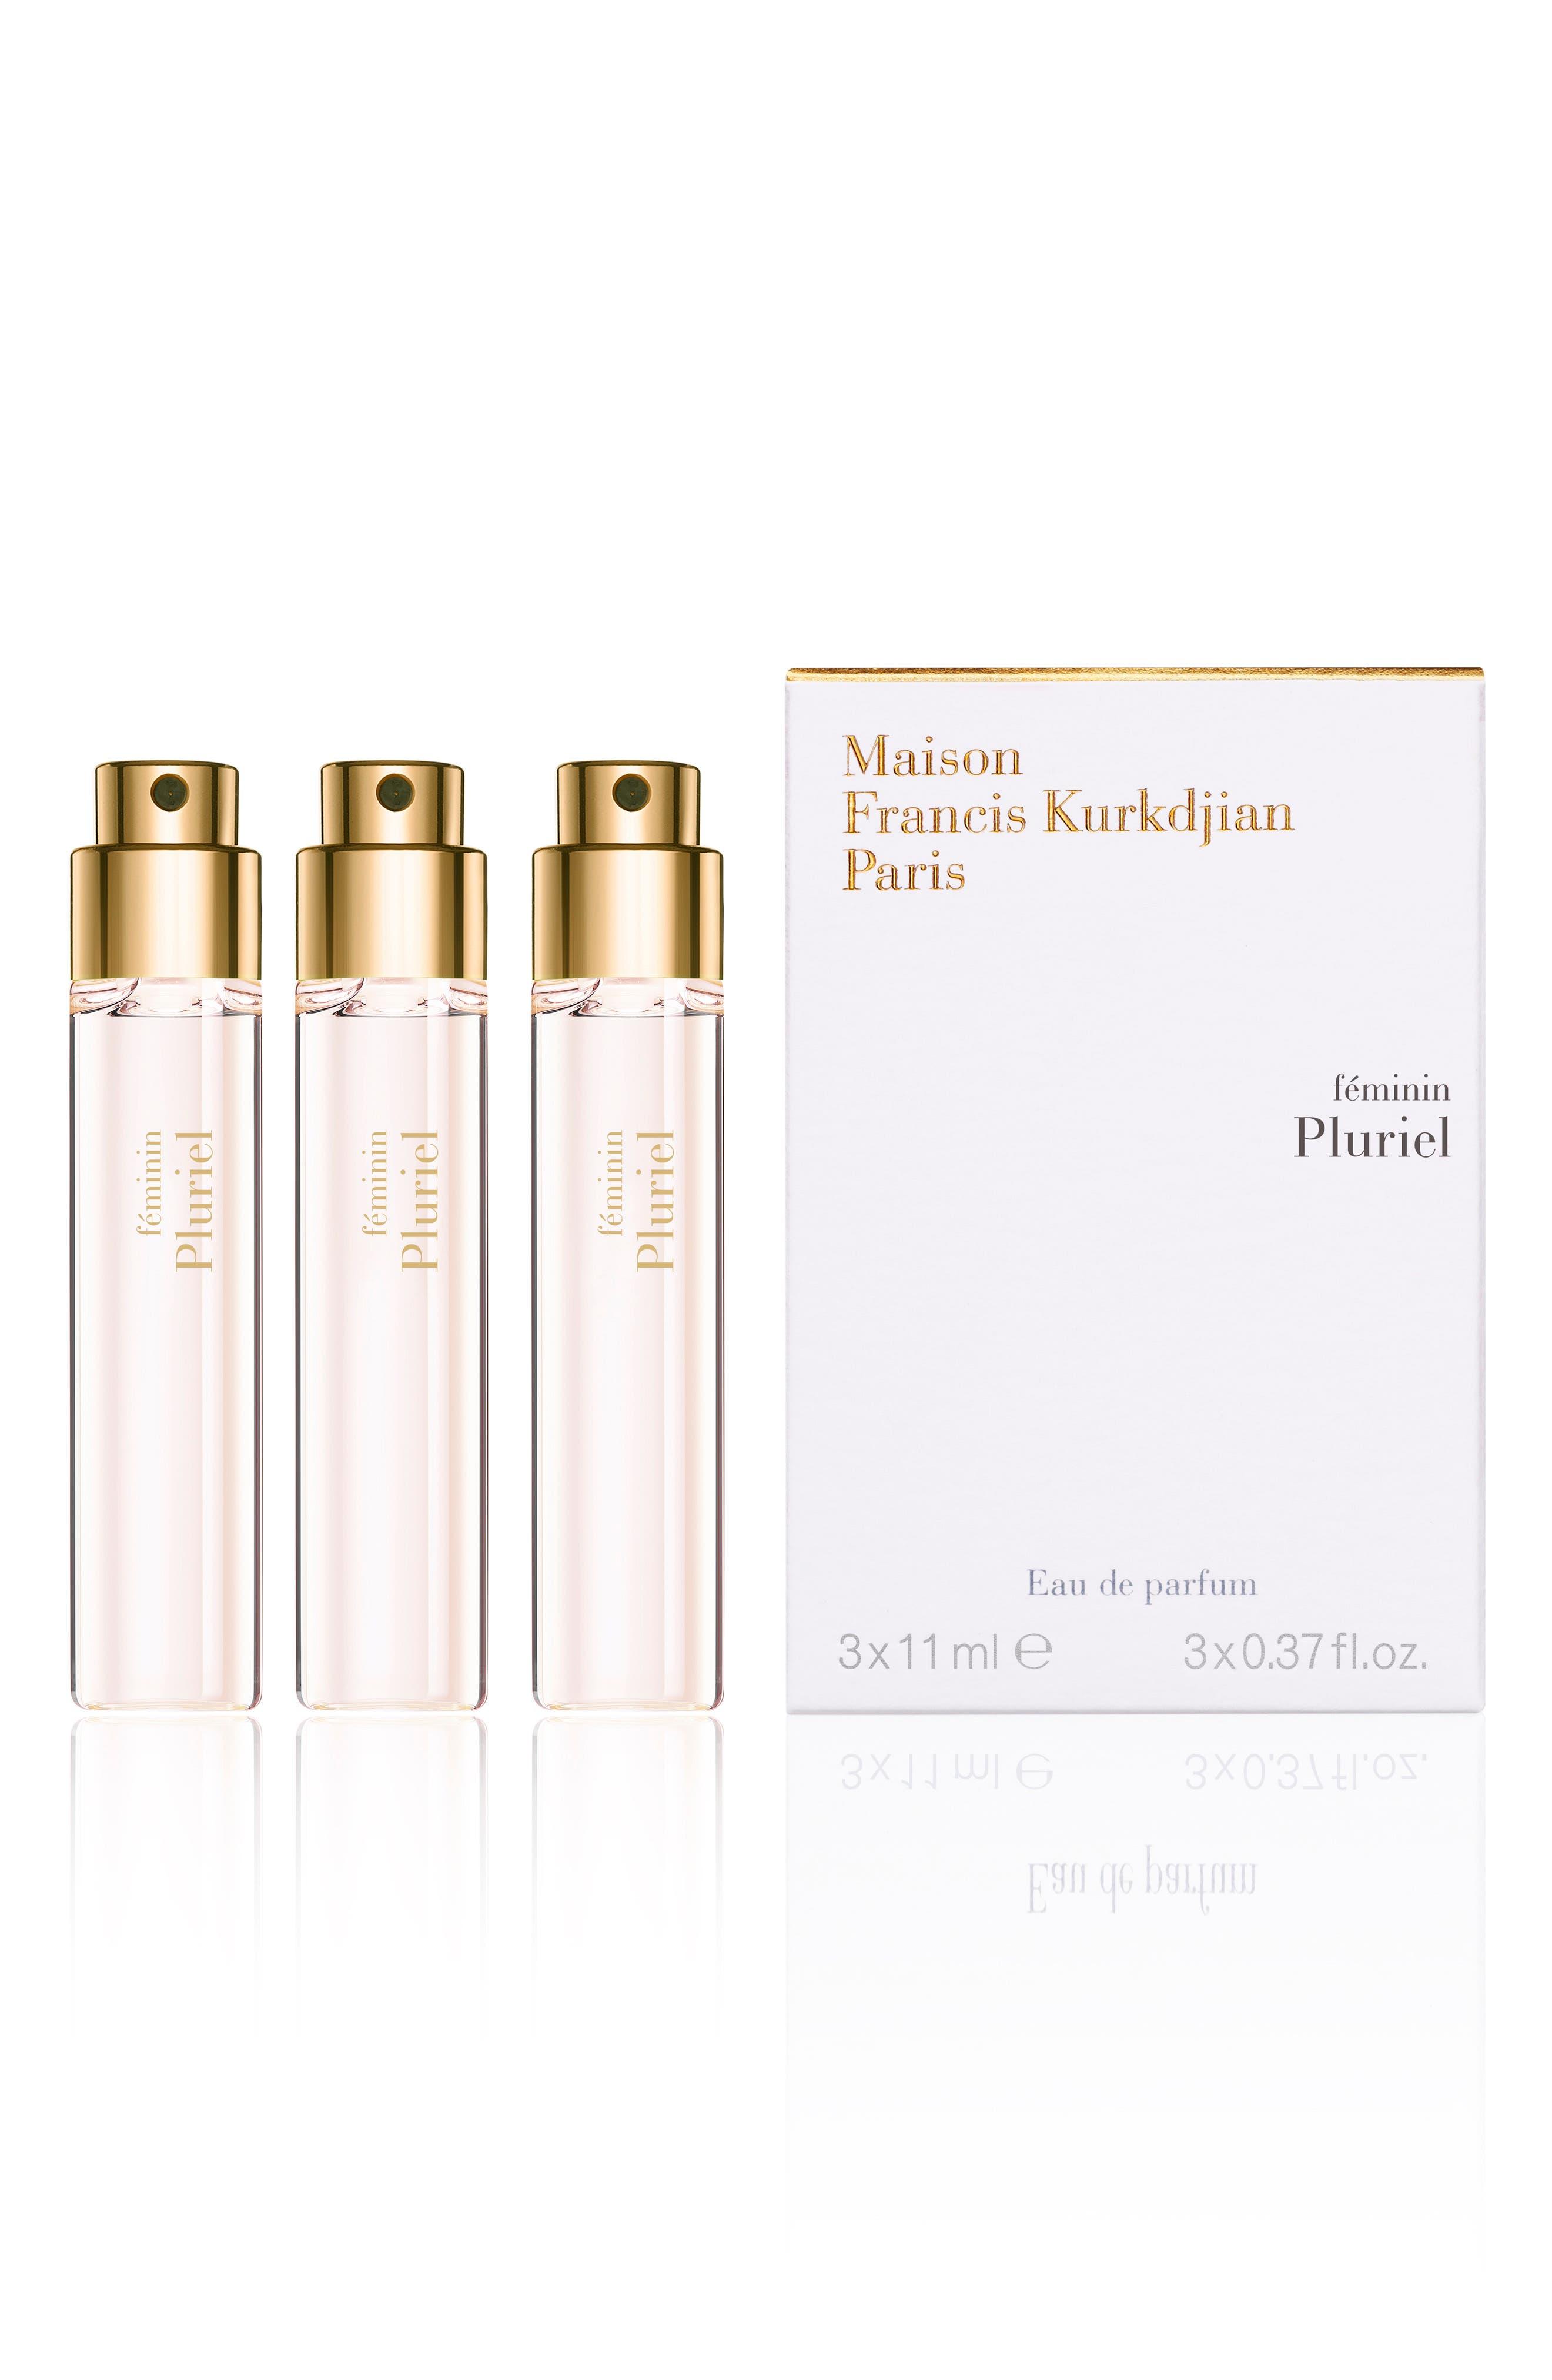 Paris Feminin Pluriel Eau De Parfum Refill Trio